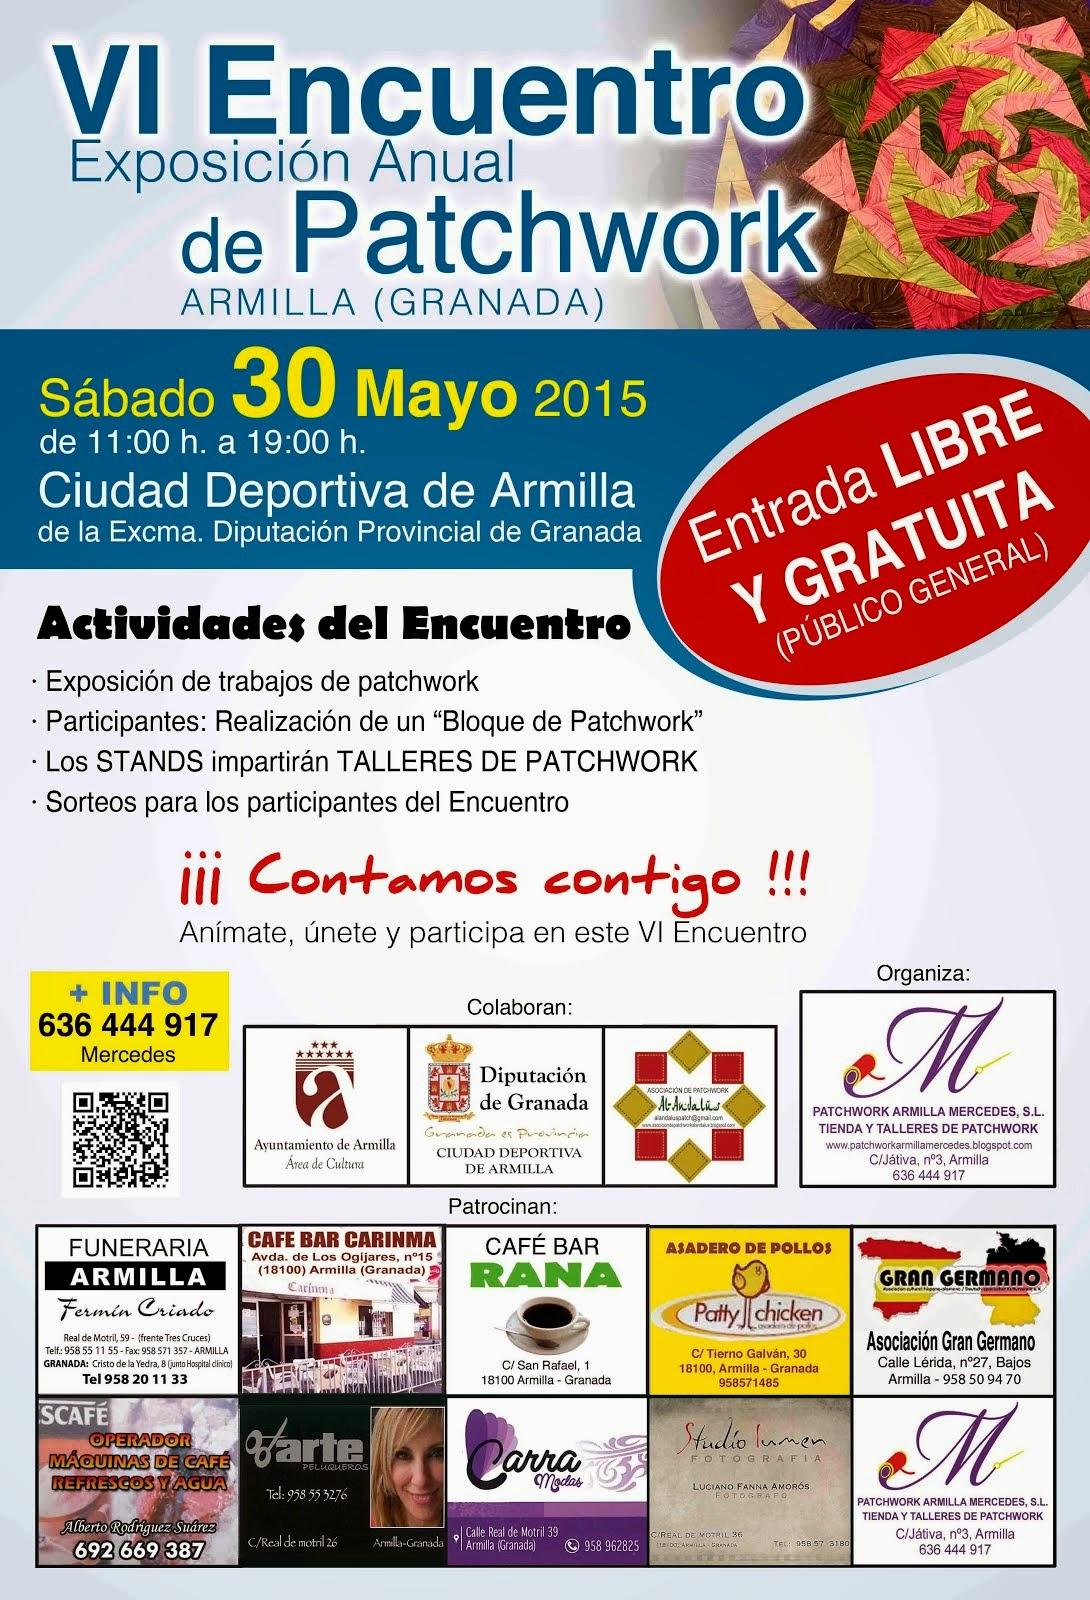 VI ENCUENTRO 30 Mayo 2015